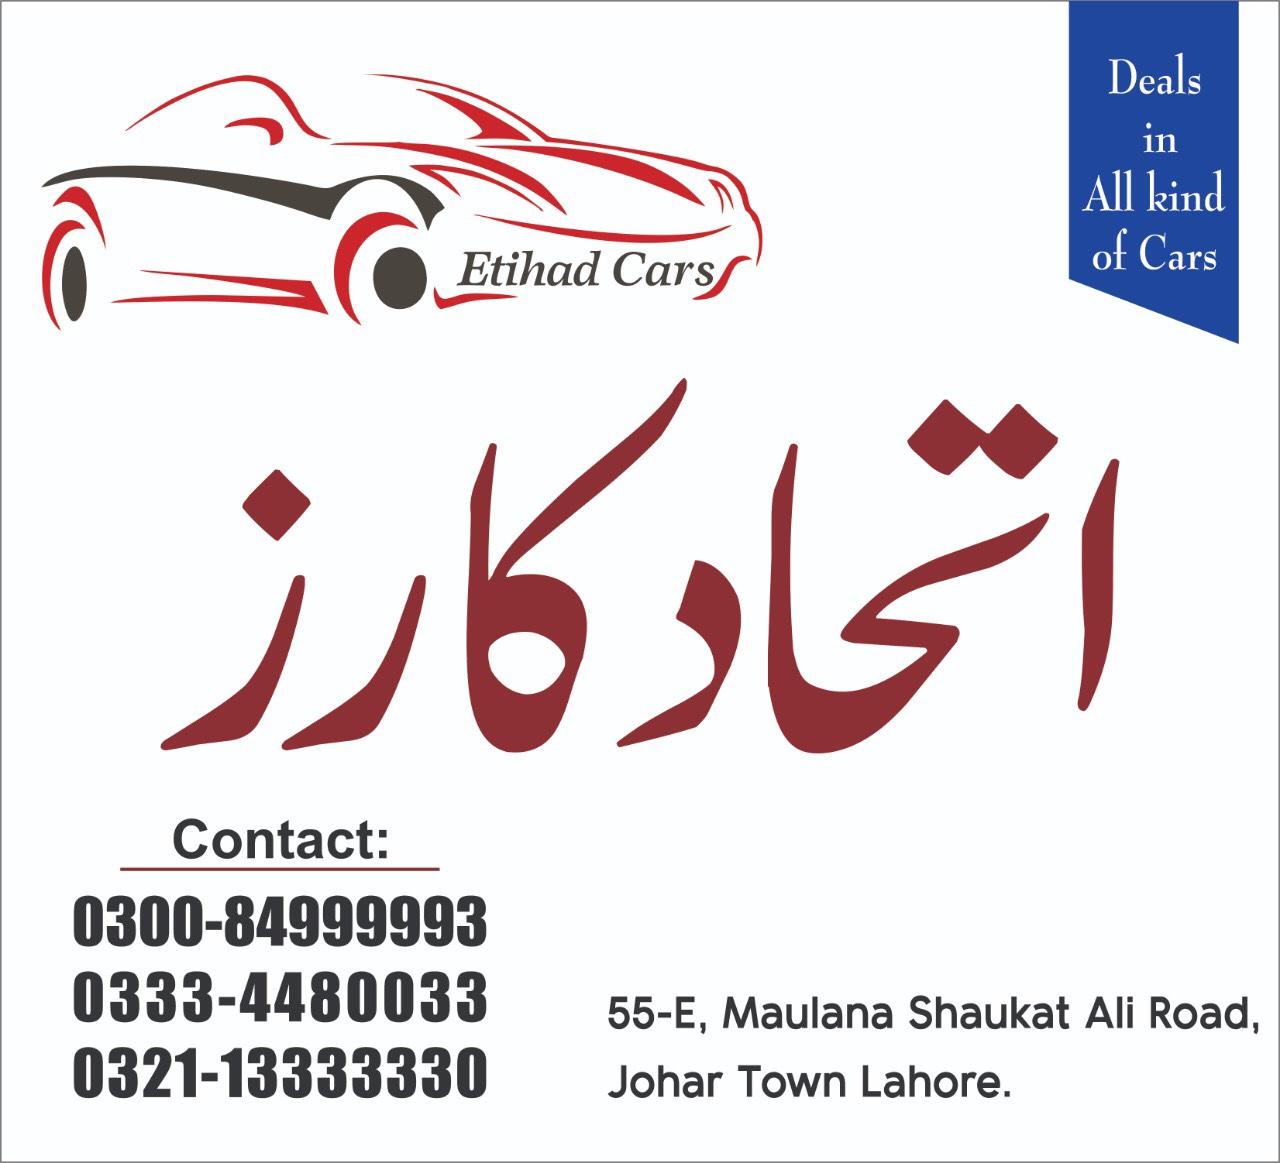 Ethad Cars